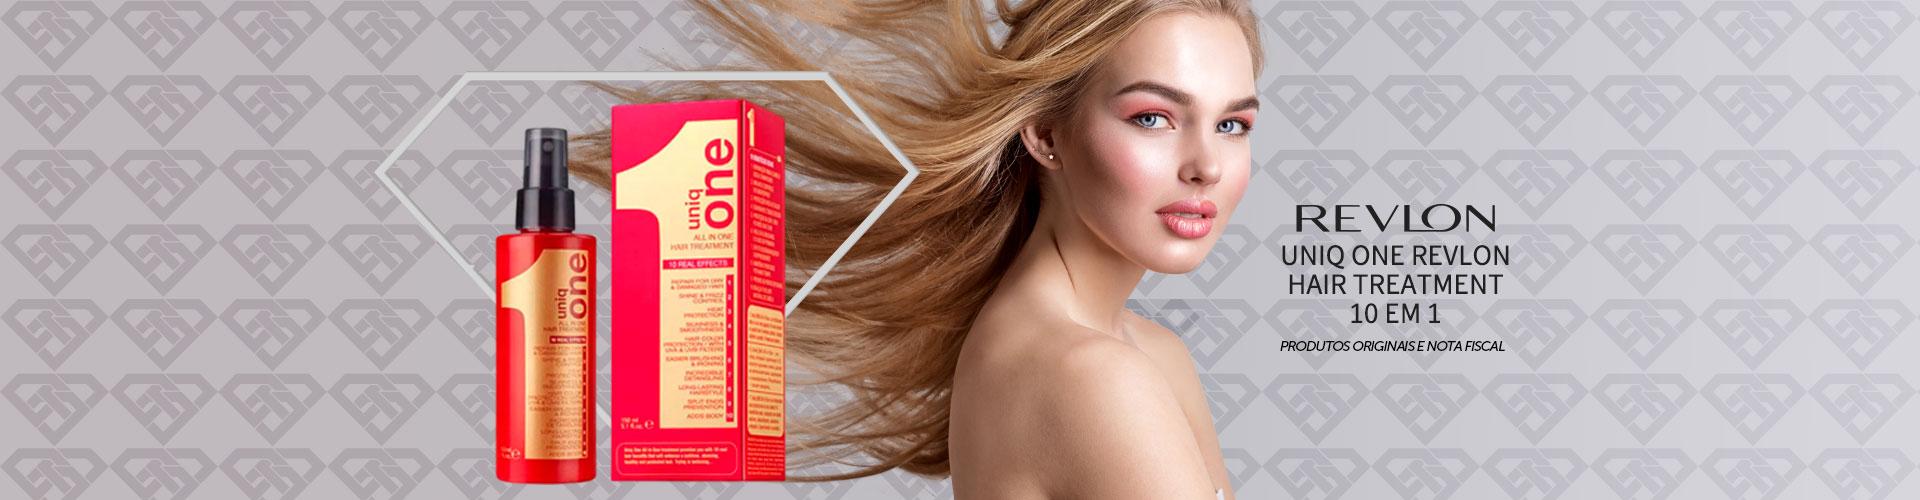 Uniq One Revlon Hair Treatment 10 Em 1